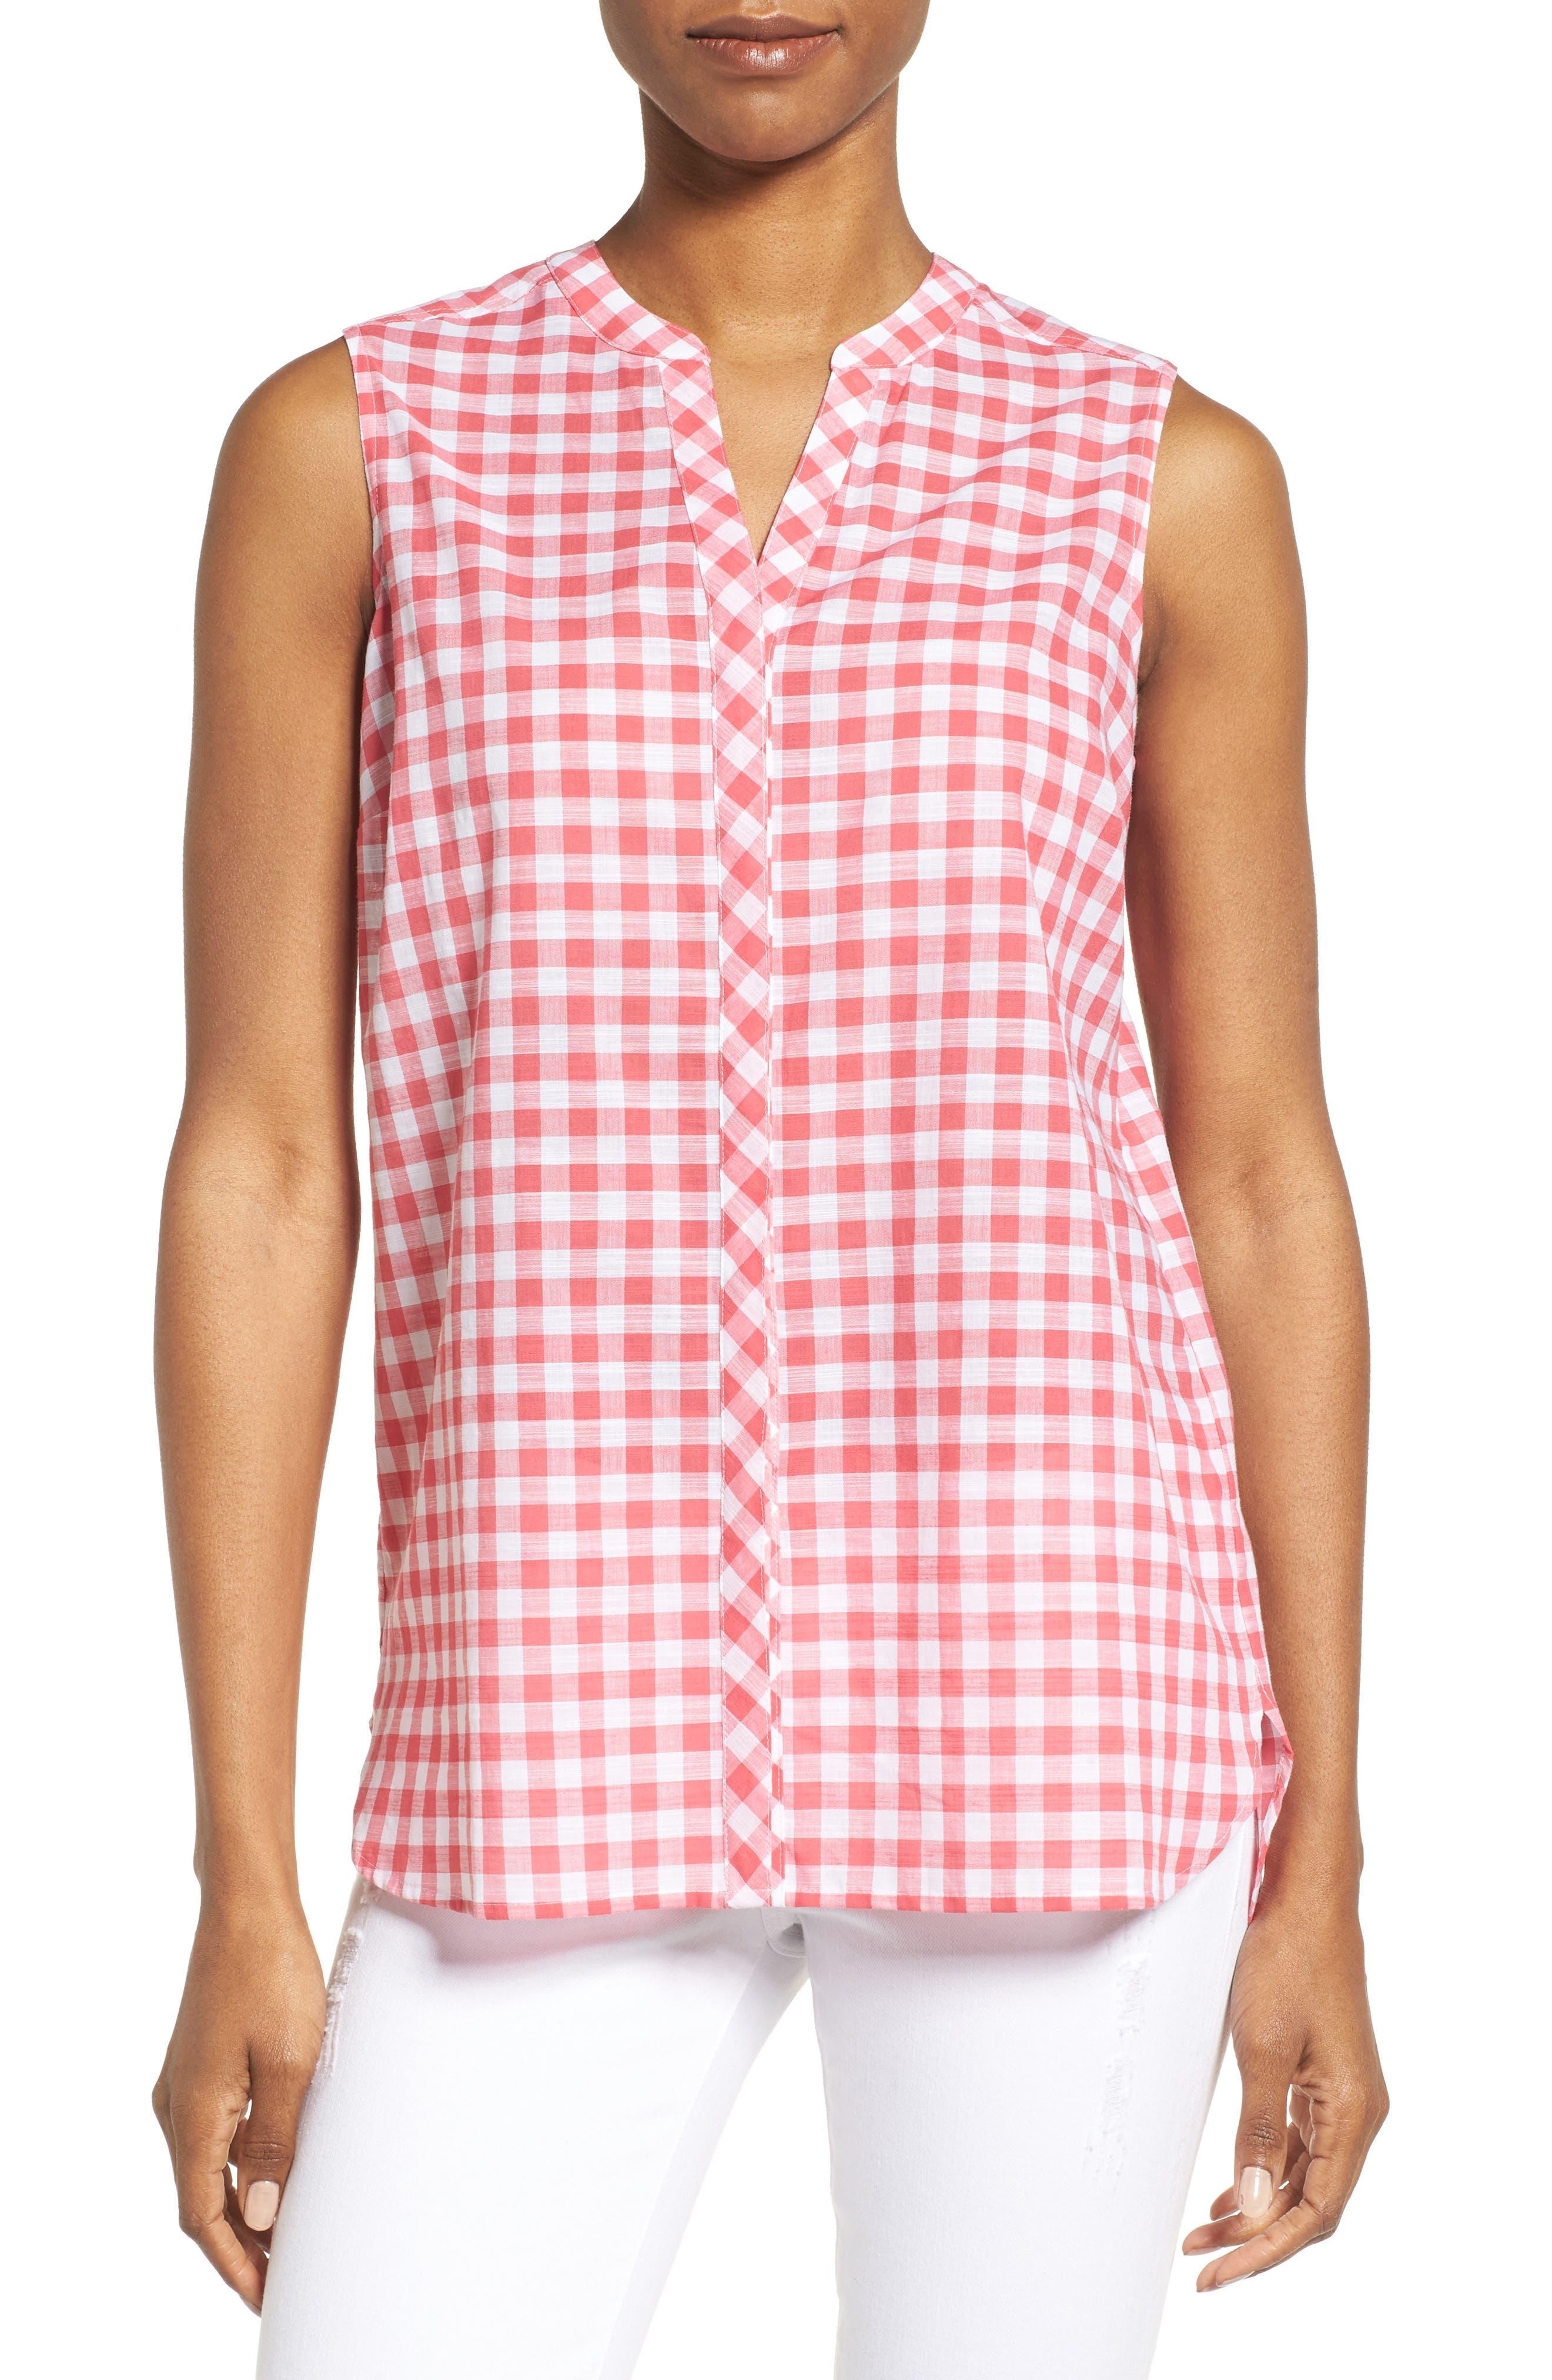 Main Image - Foxcroft Gingham Sleeveless Shirt (Regular & Petites)